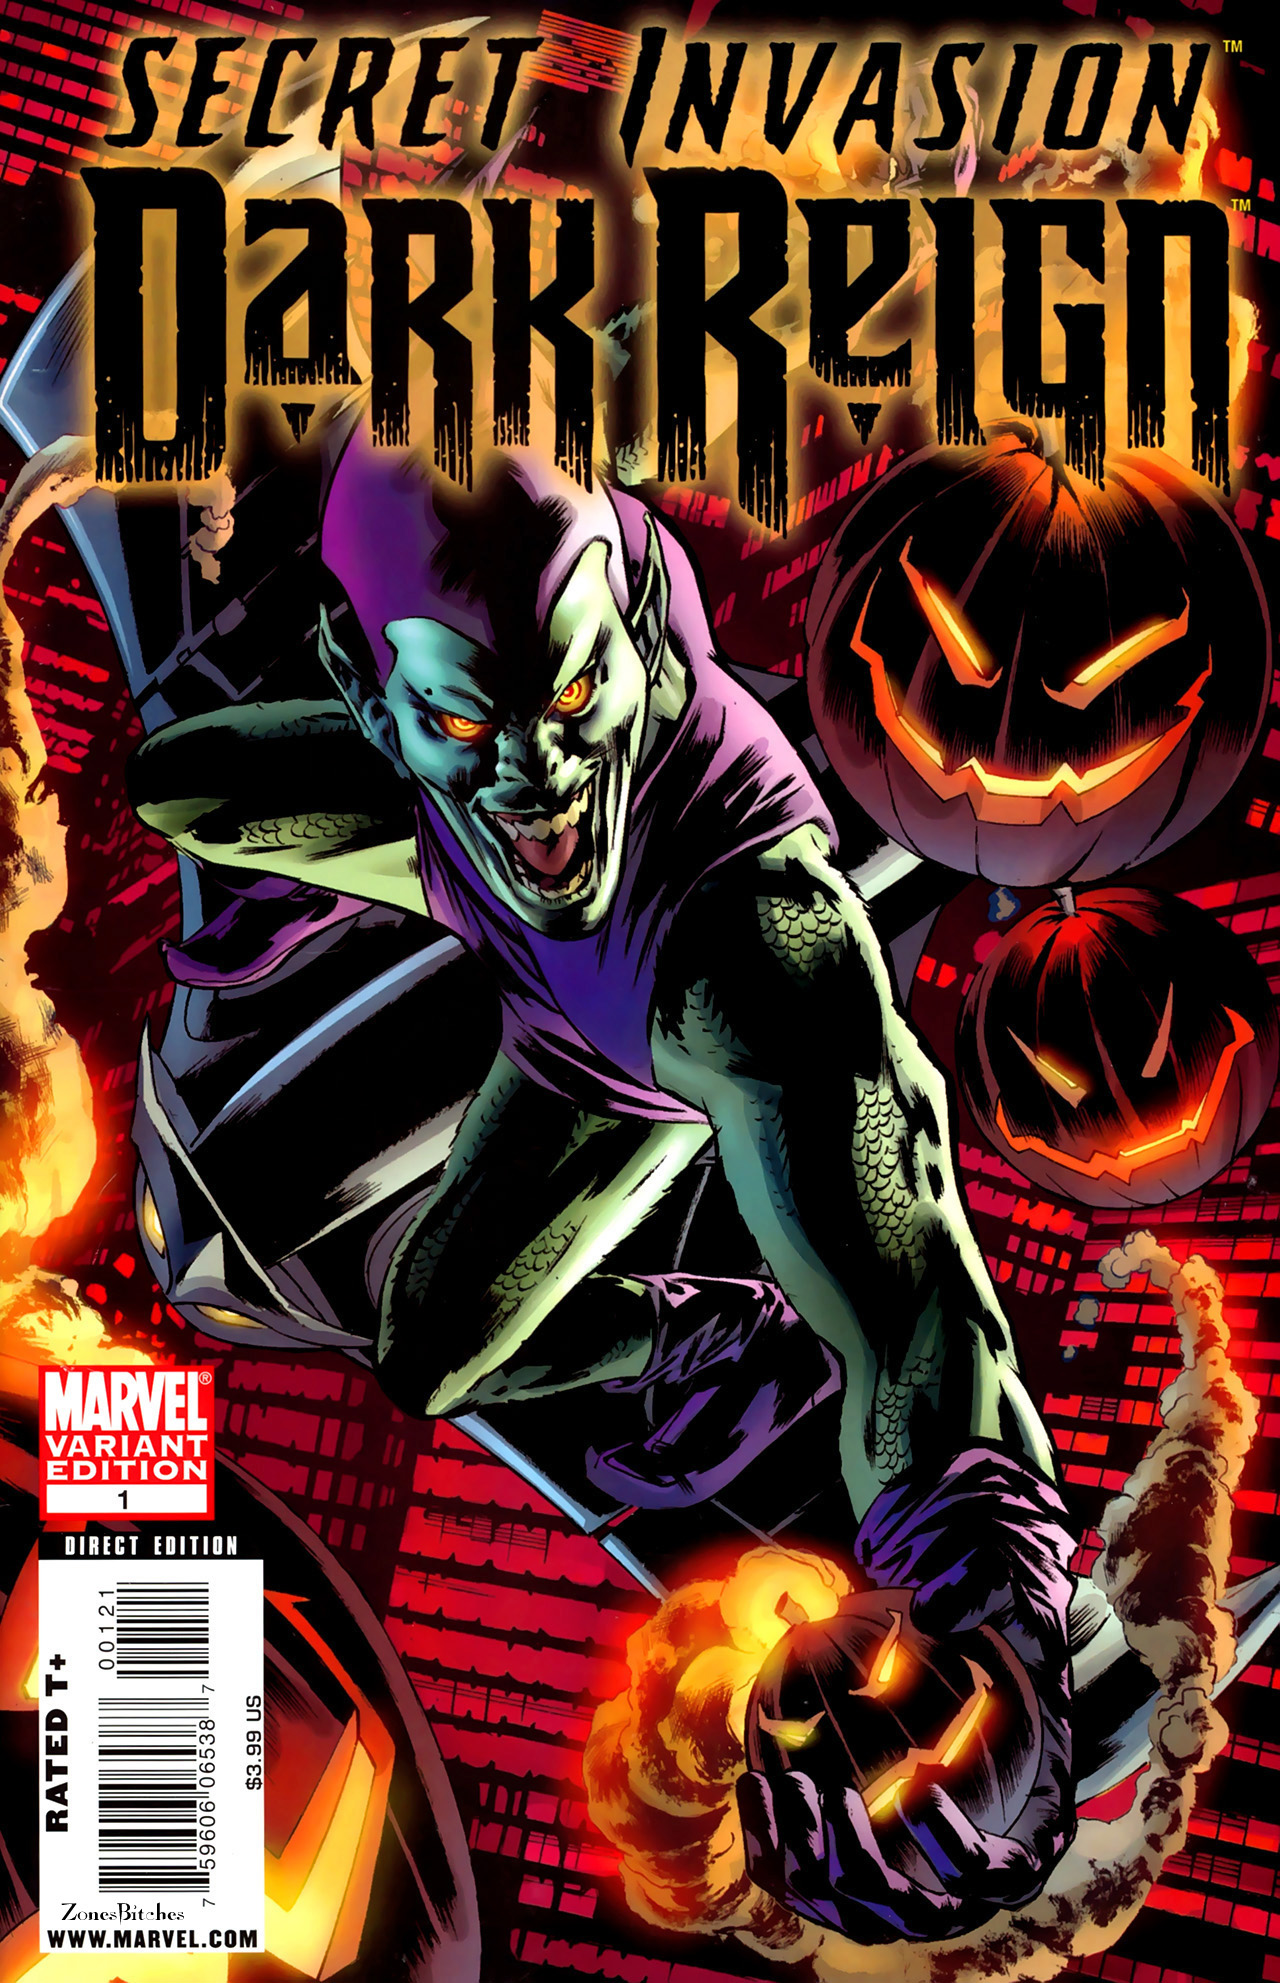 Read online Secret Invasion: Dark Reign comic -  Issue # Full - 2